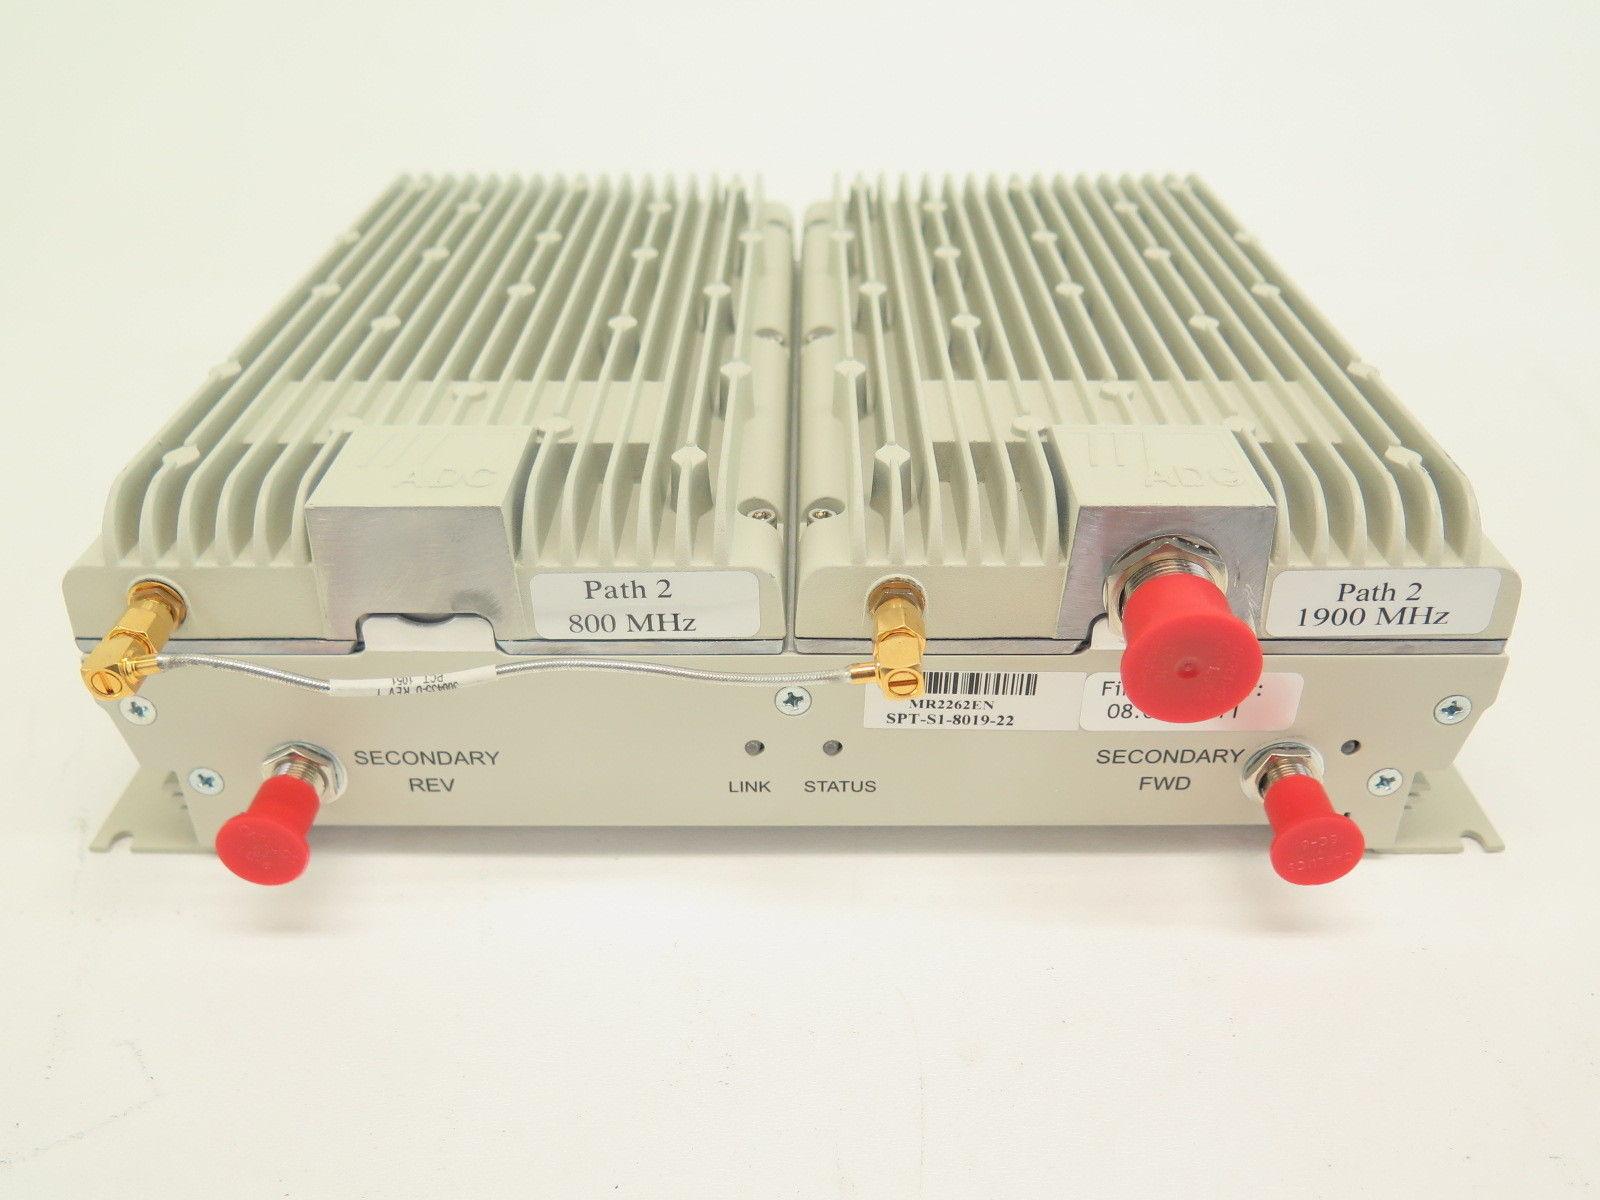 Tyco Electronics SPT-S1-8019-22 Spectrum P1 800 MHz P2 1900 MHz Secondary RAU